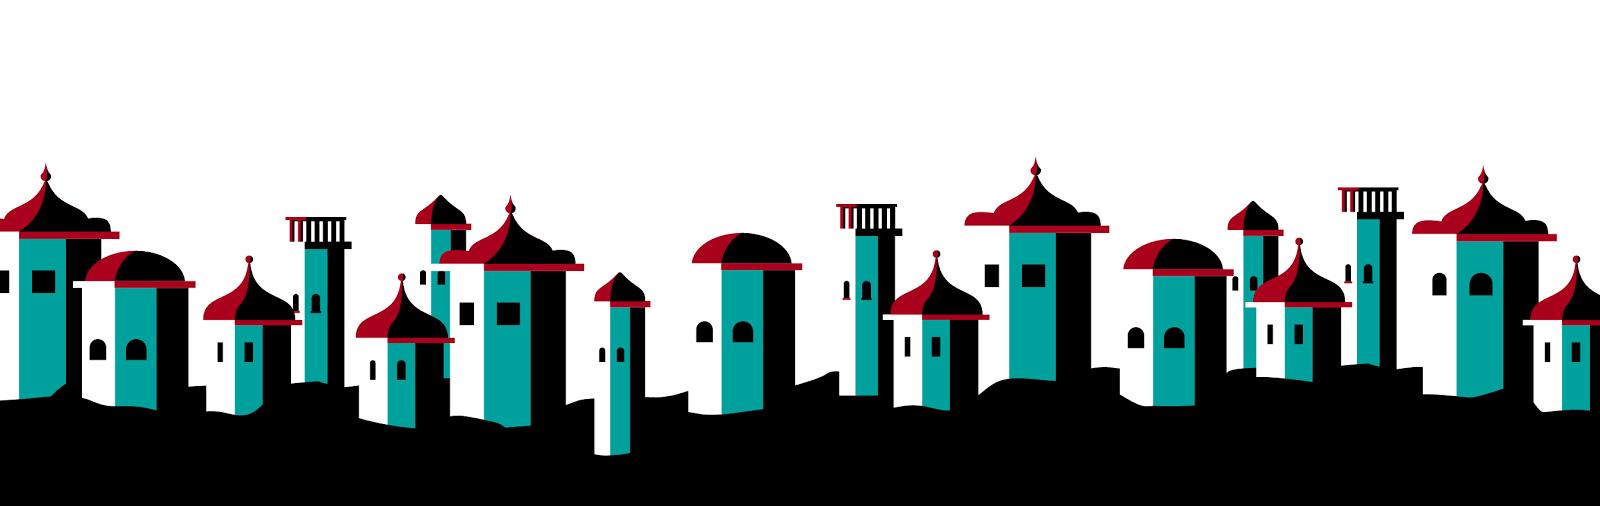 Buildings in a Line - Jen Haugan Animation & Illustration